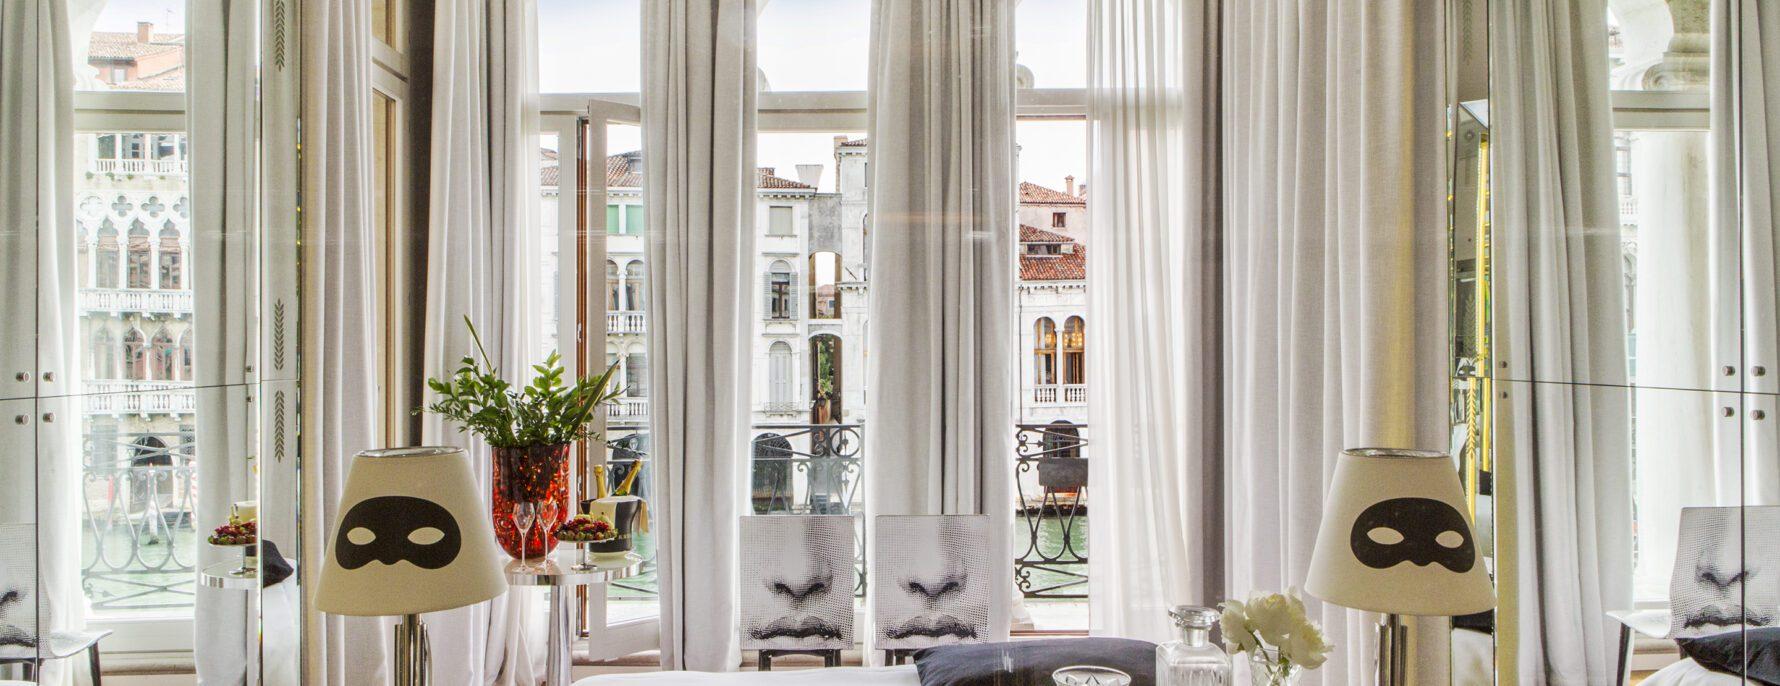 Luxury Boutique Hotel in Venice